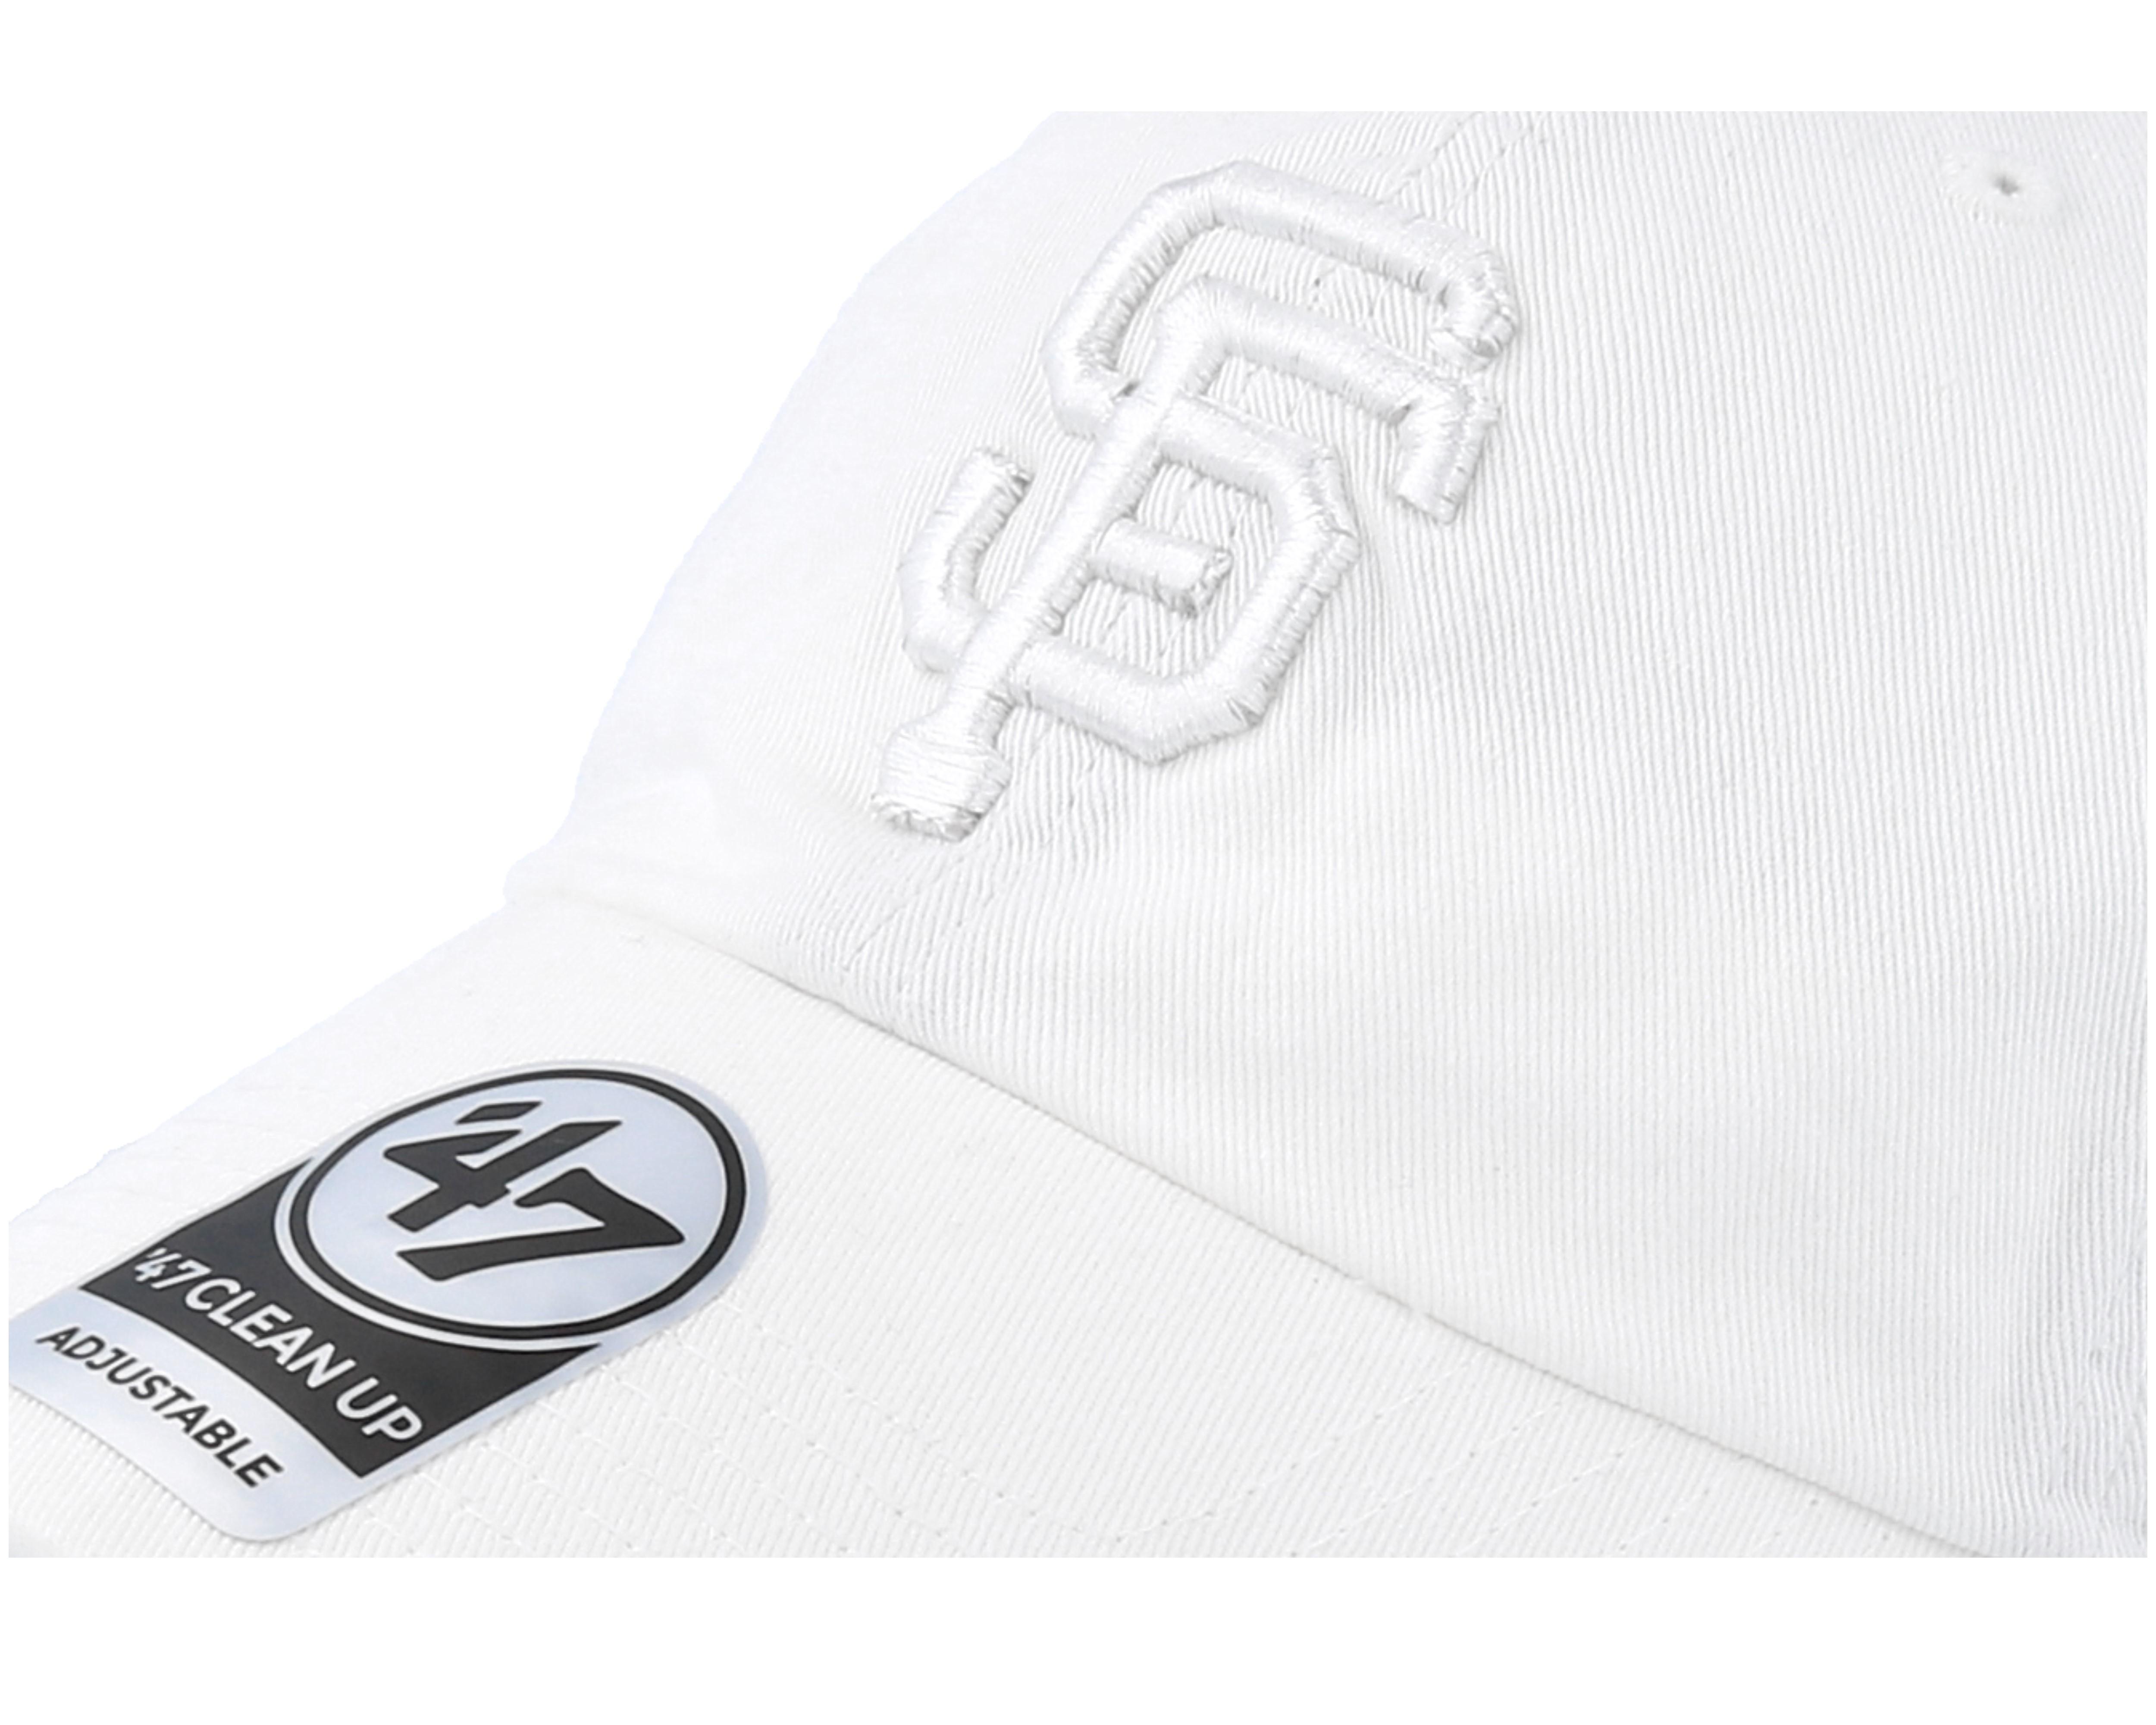 san francisco giants clean up white white adjustable 47 brand cap. Black Bedroom Furniture Sets. Home Design Ideas